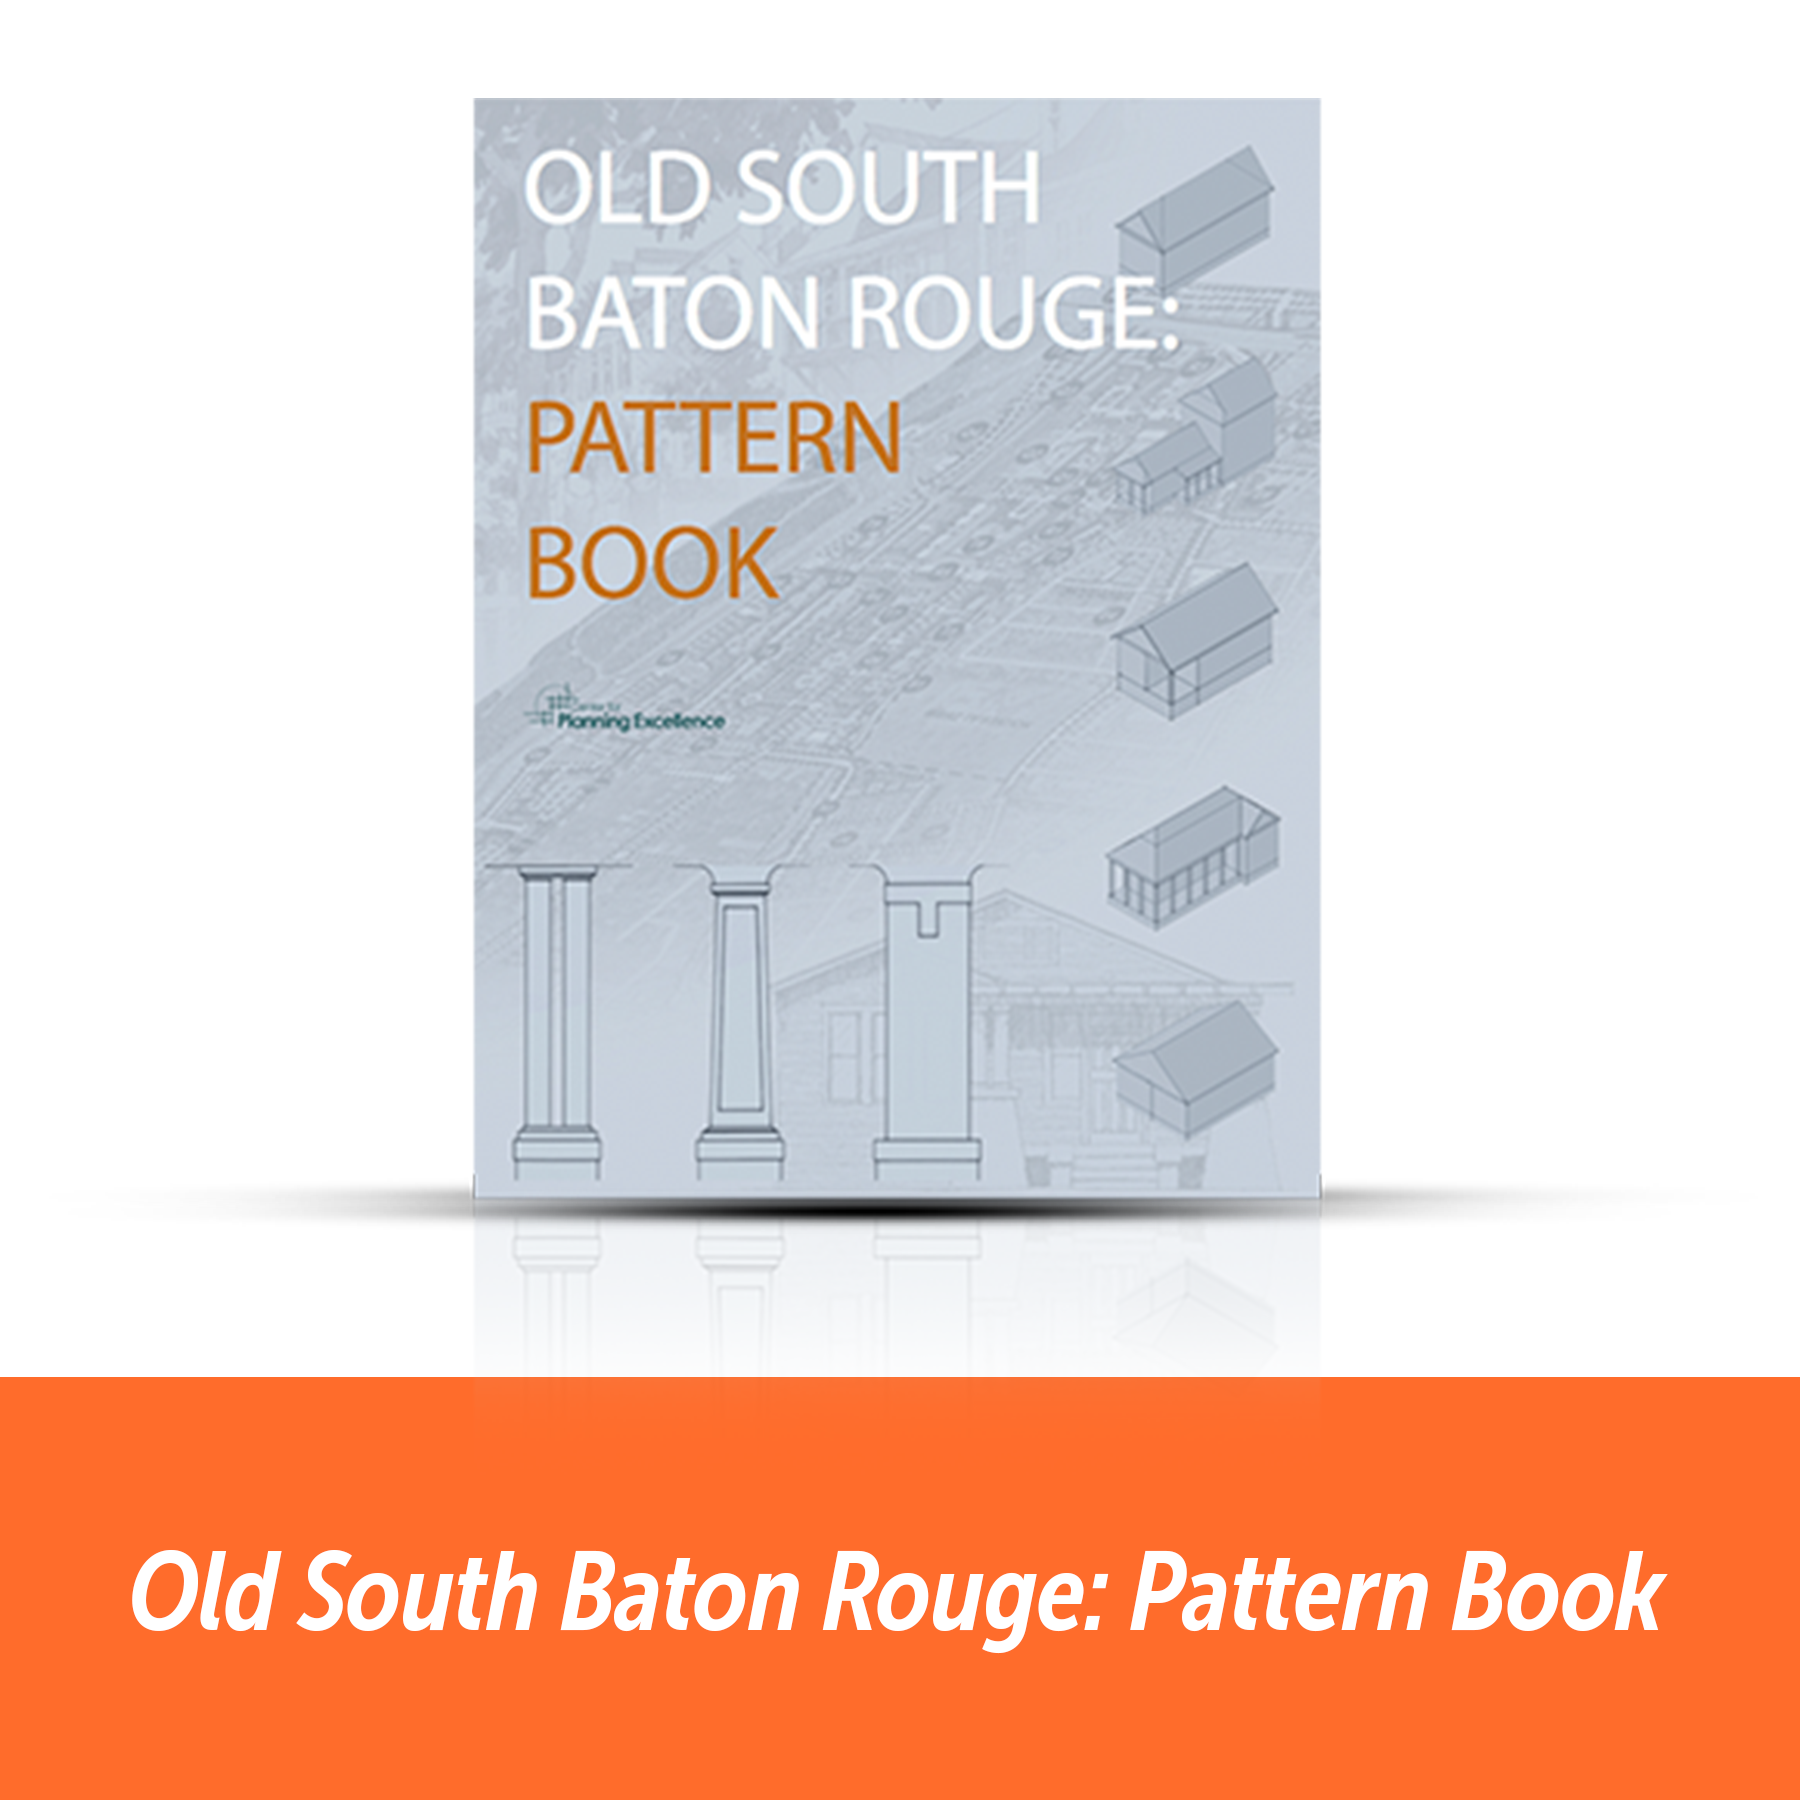 OSBR Pattern Book.png